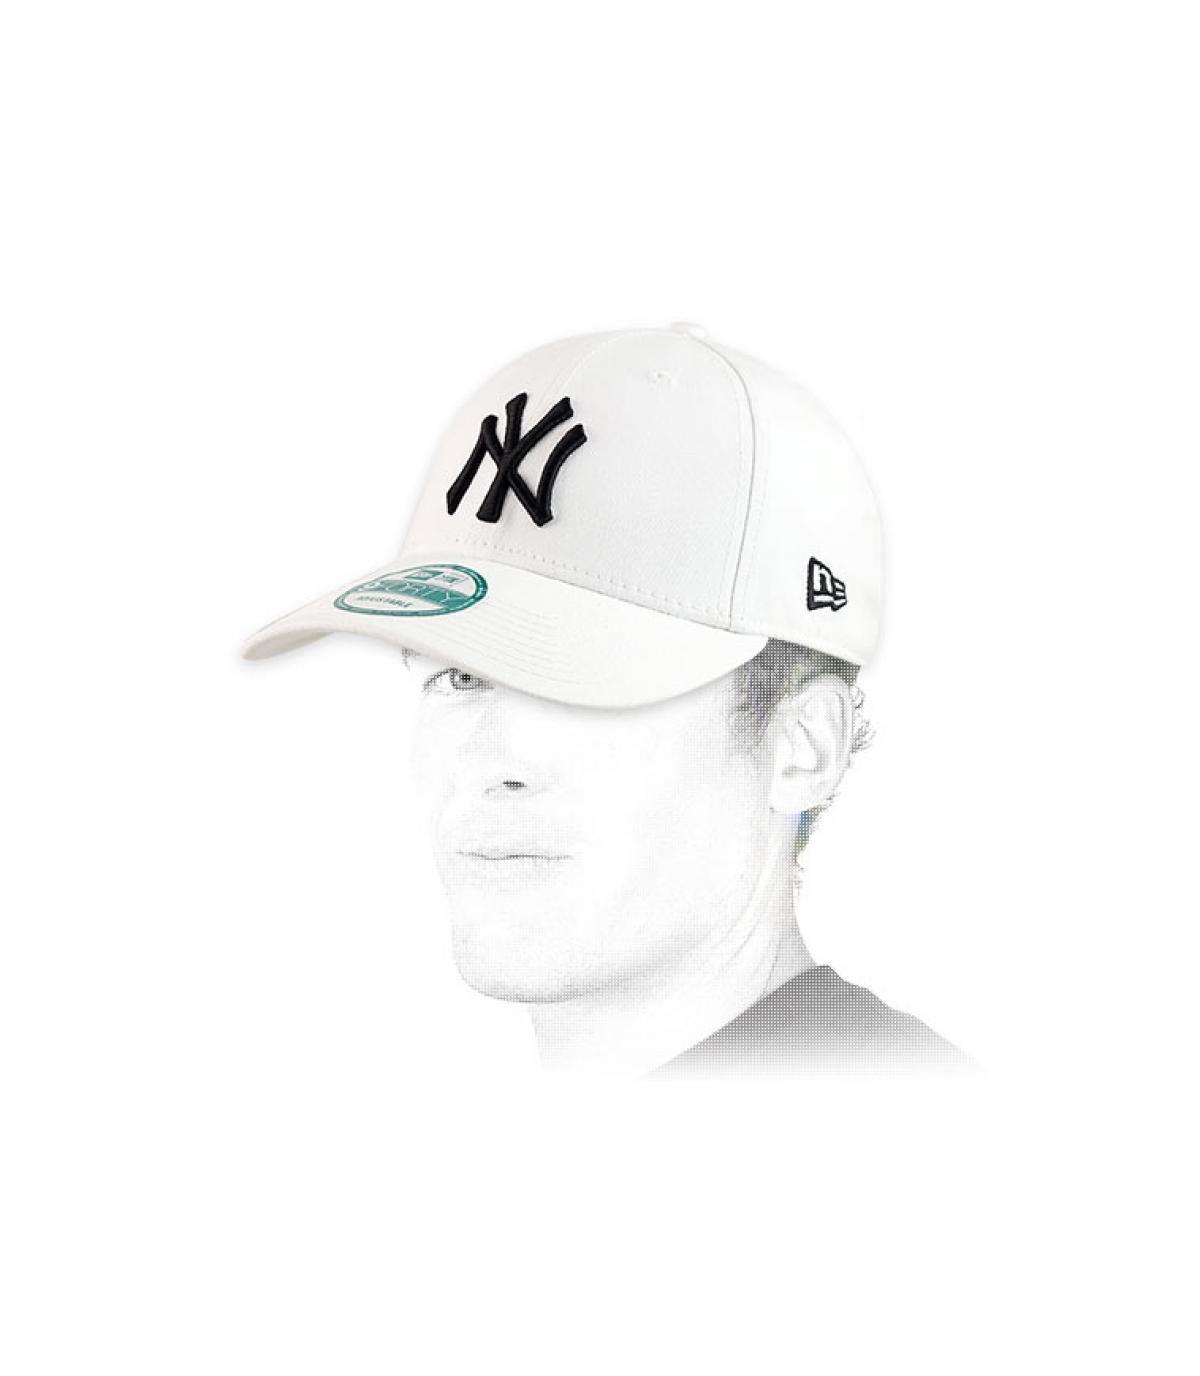 Dettagli White trucker NY fitted - image 5